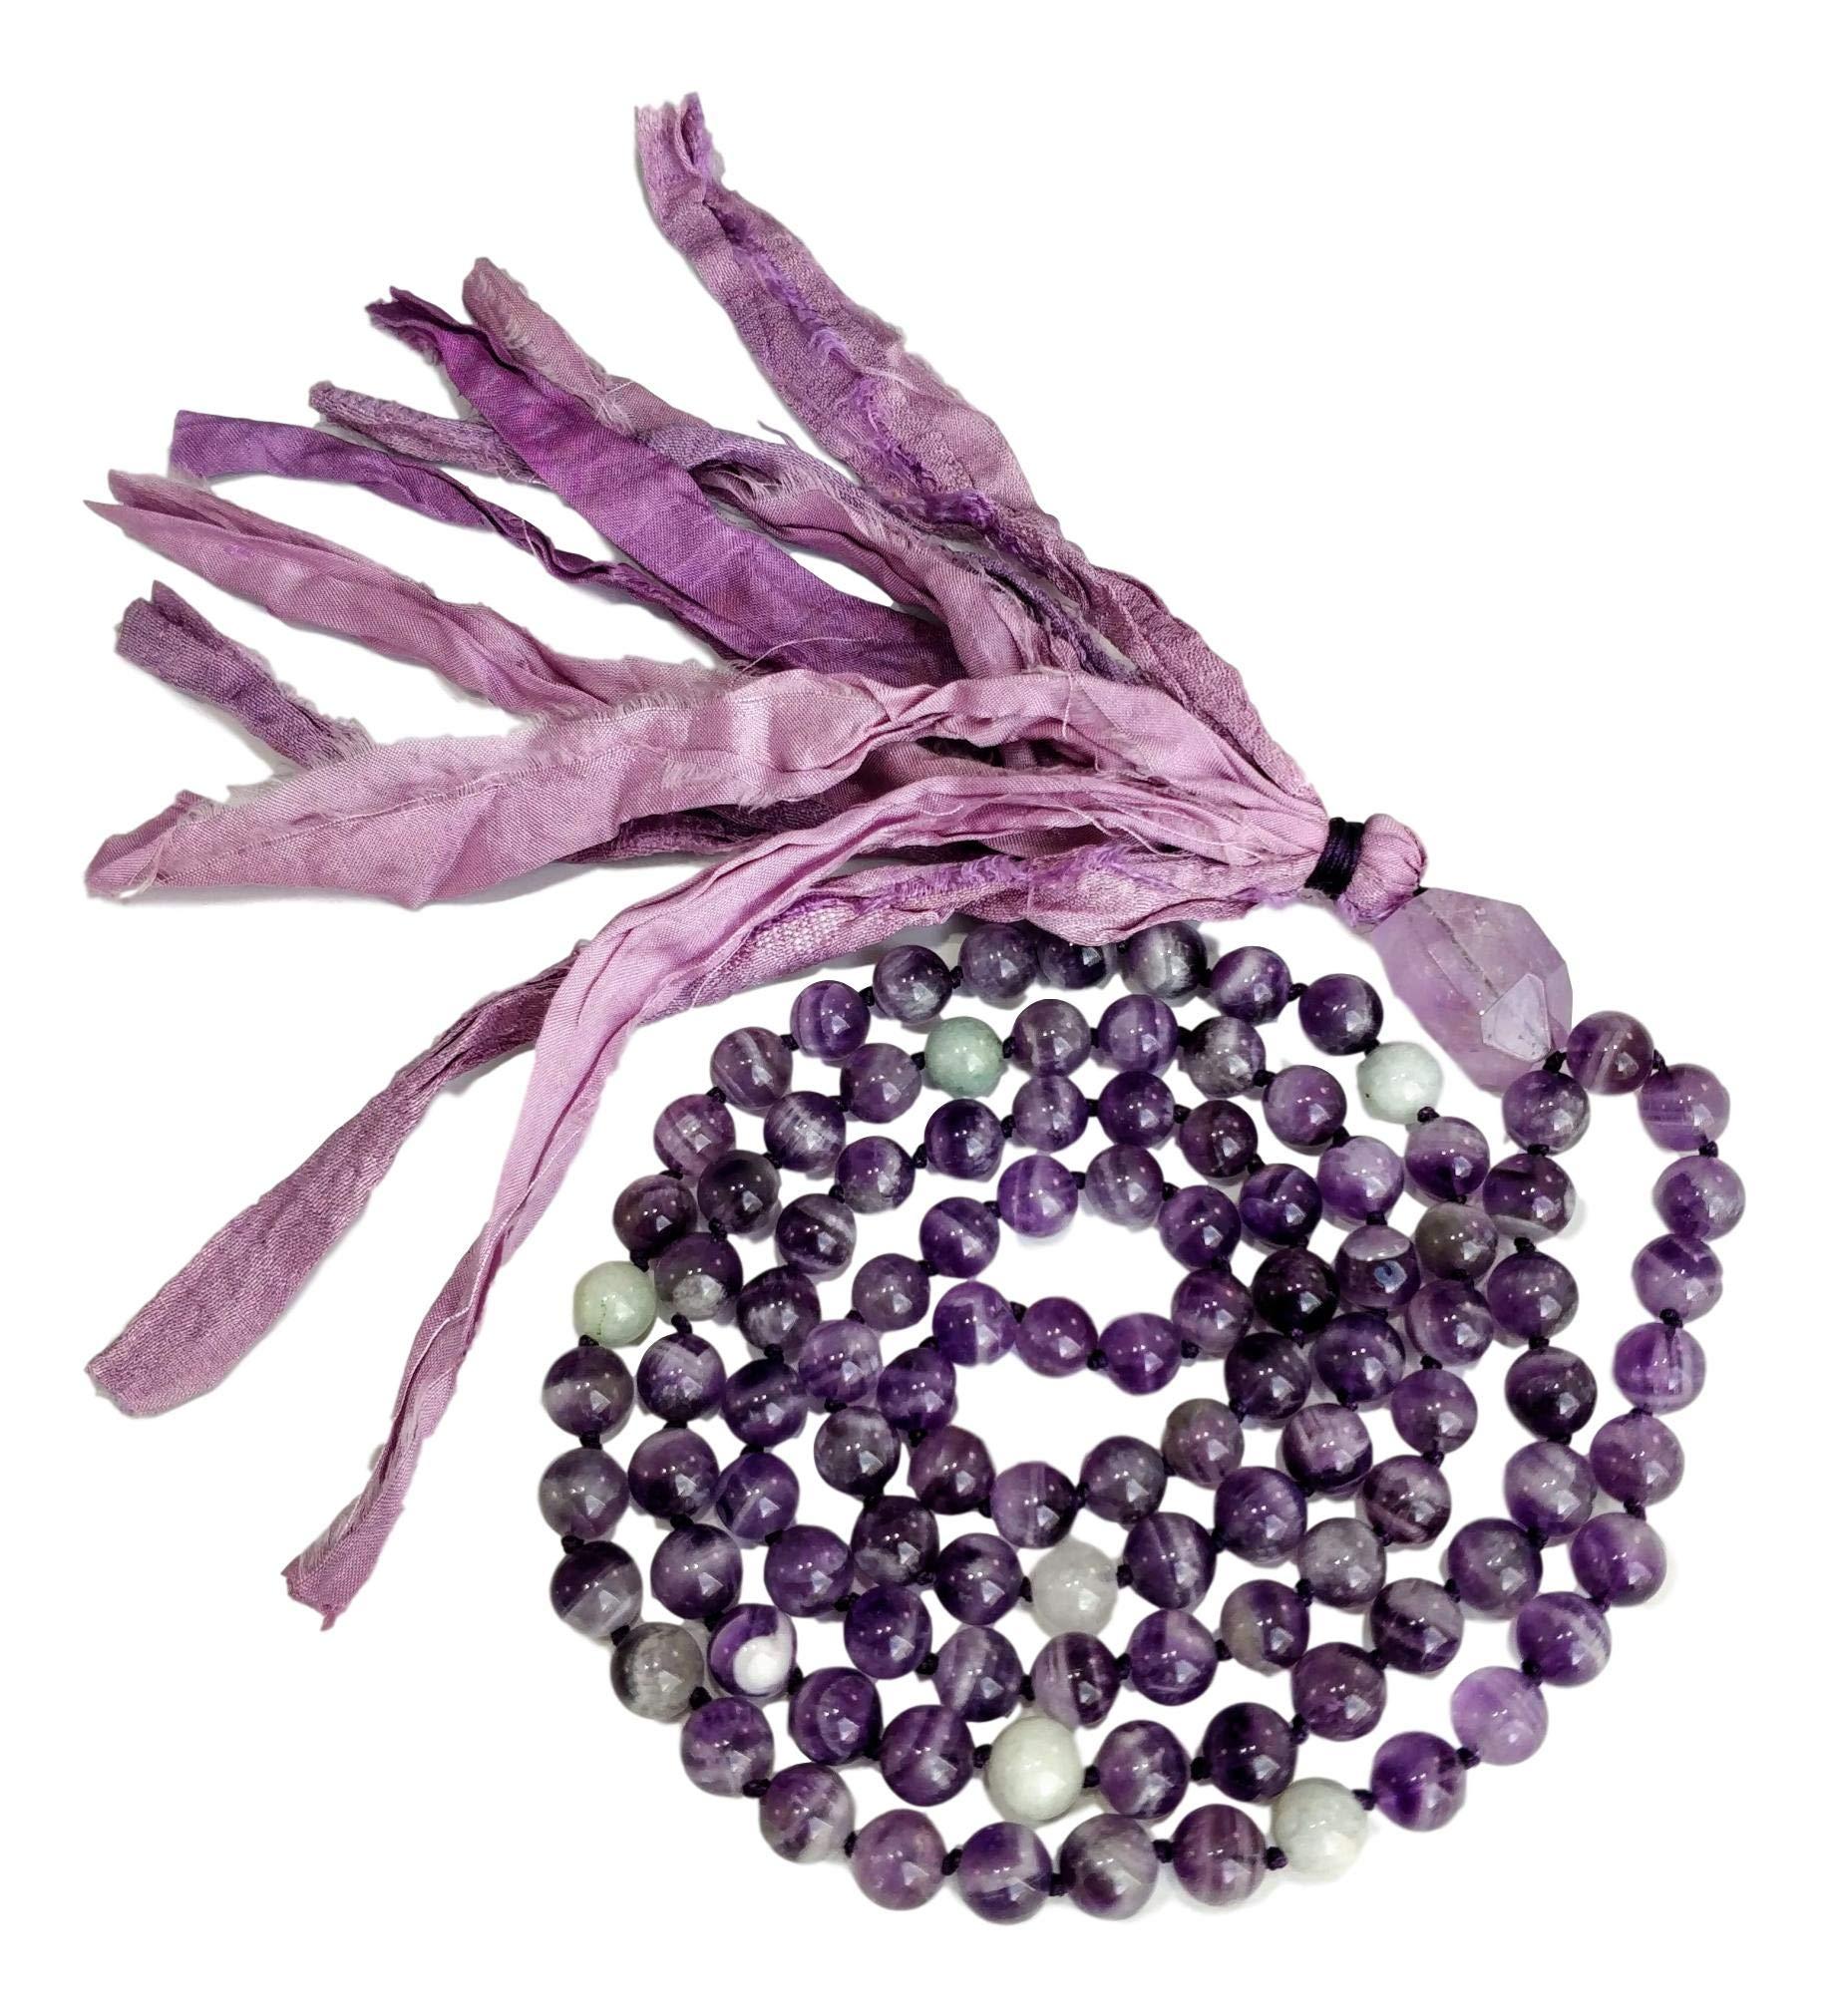 Live Radiantly 108 Mala Bead Necklace - 8mm Amethyst Aquamarine Stones - Amethyst Guru Bead - Sari Silk Tassel - Meditation, Mindfulness, Yoga - Mala to Foster Protection, Peace and Abundance